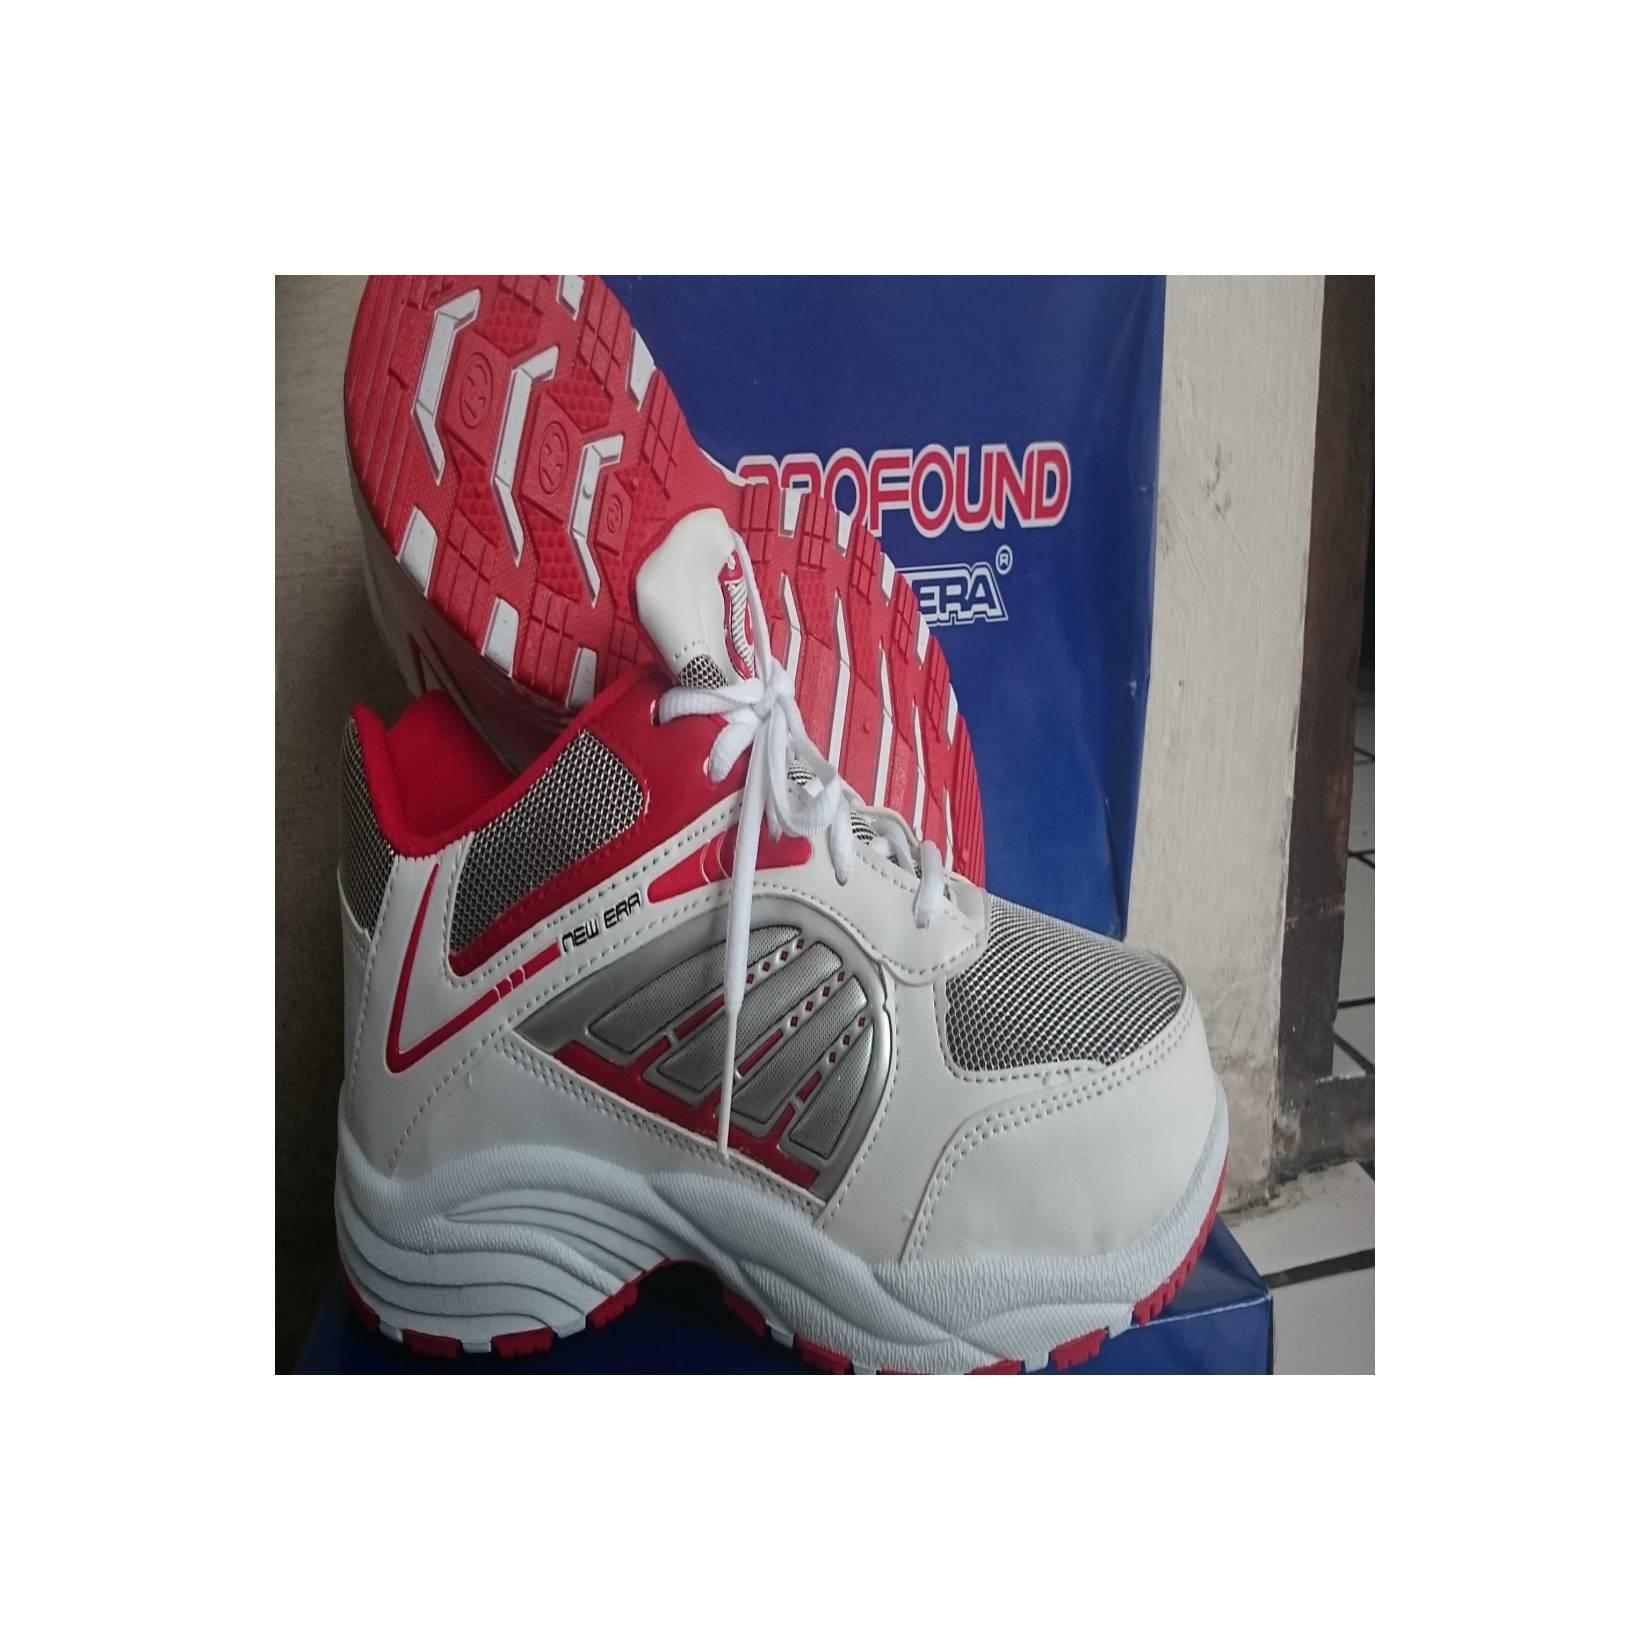 sepatu New Era / sepatu volly voli volley badminton mizuno asics att